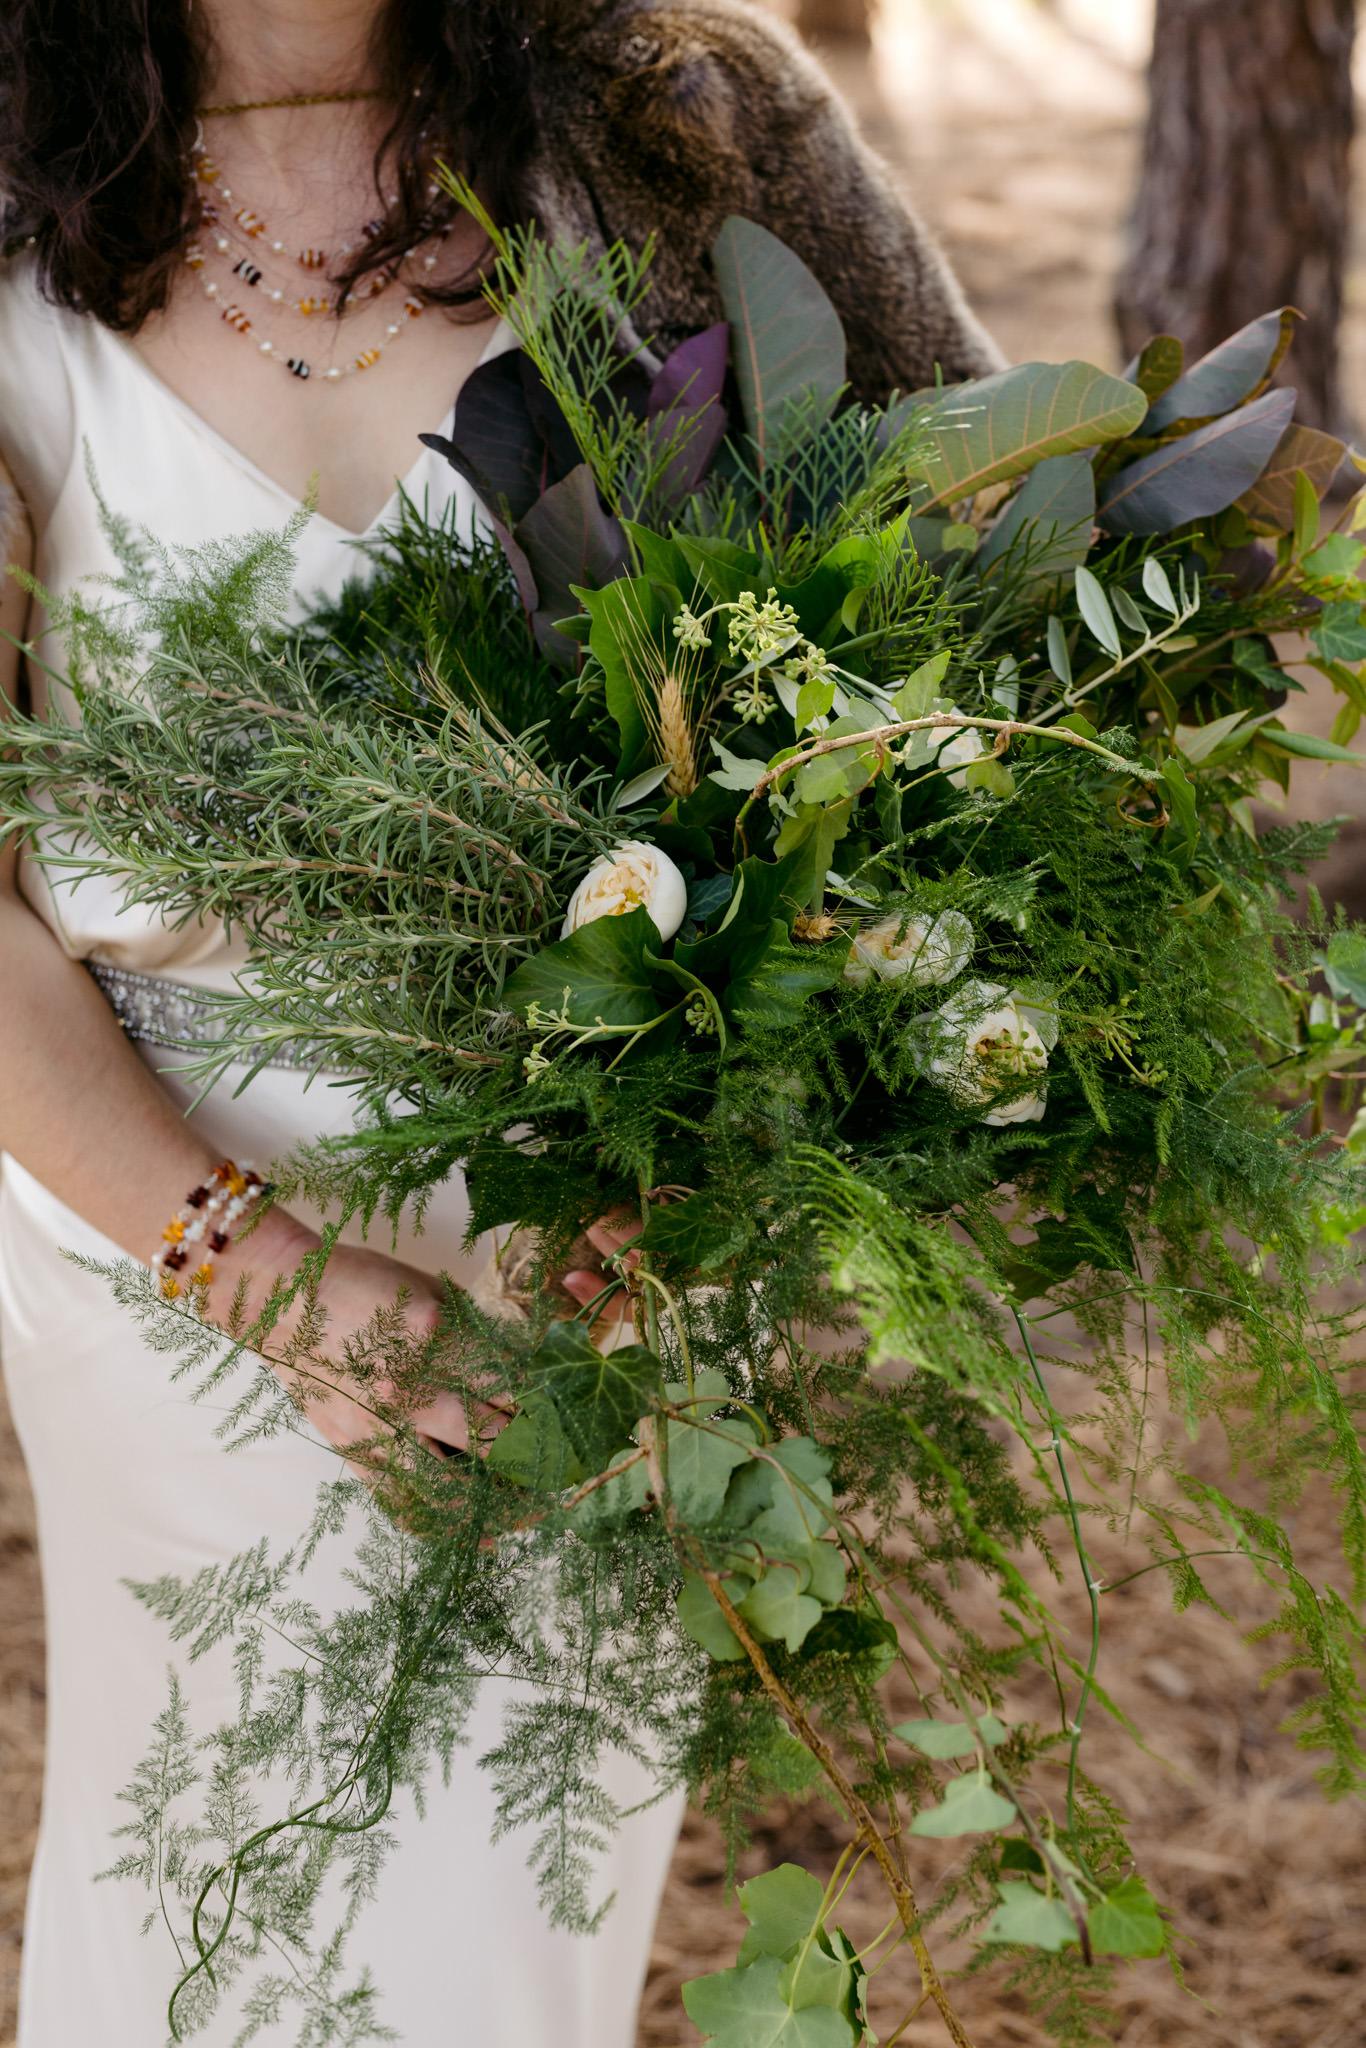 Yarralumla Woolshed Canberra Wedding Photographer Erin Latimore_299.JPG